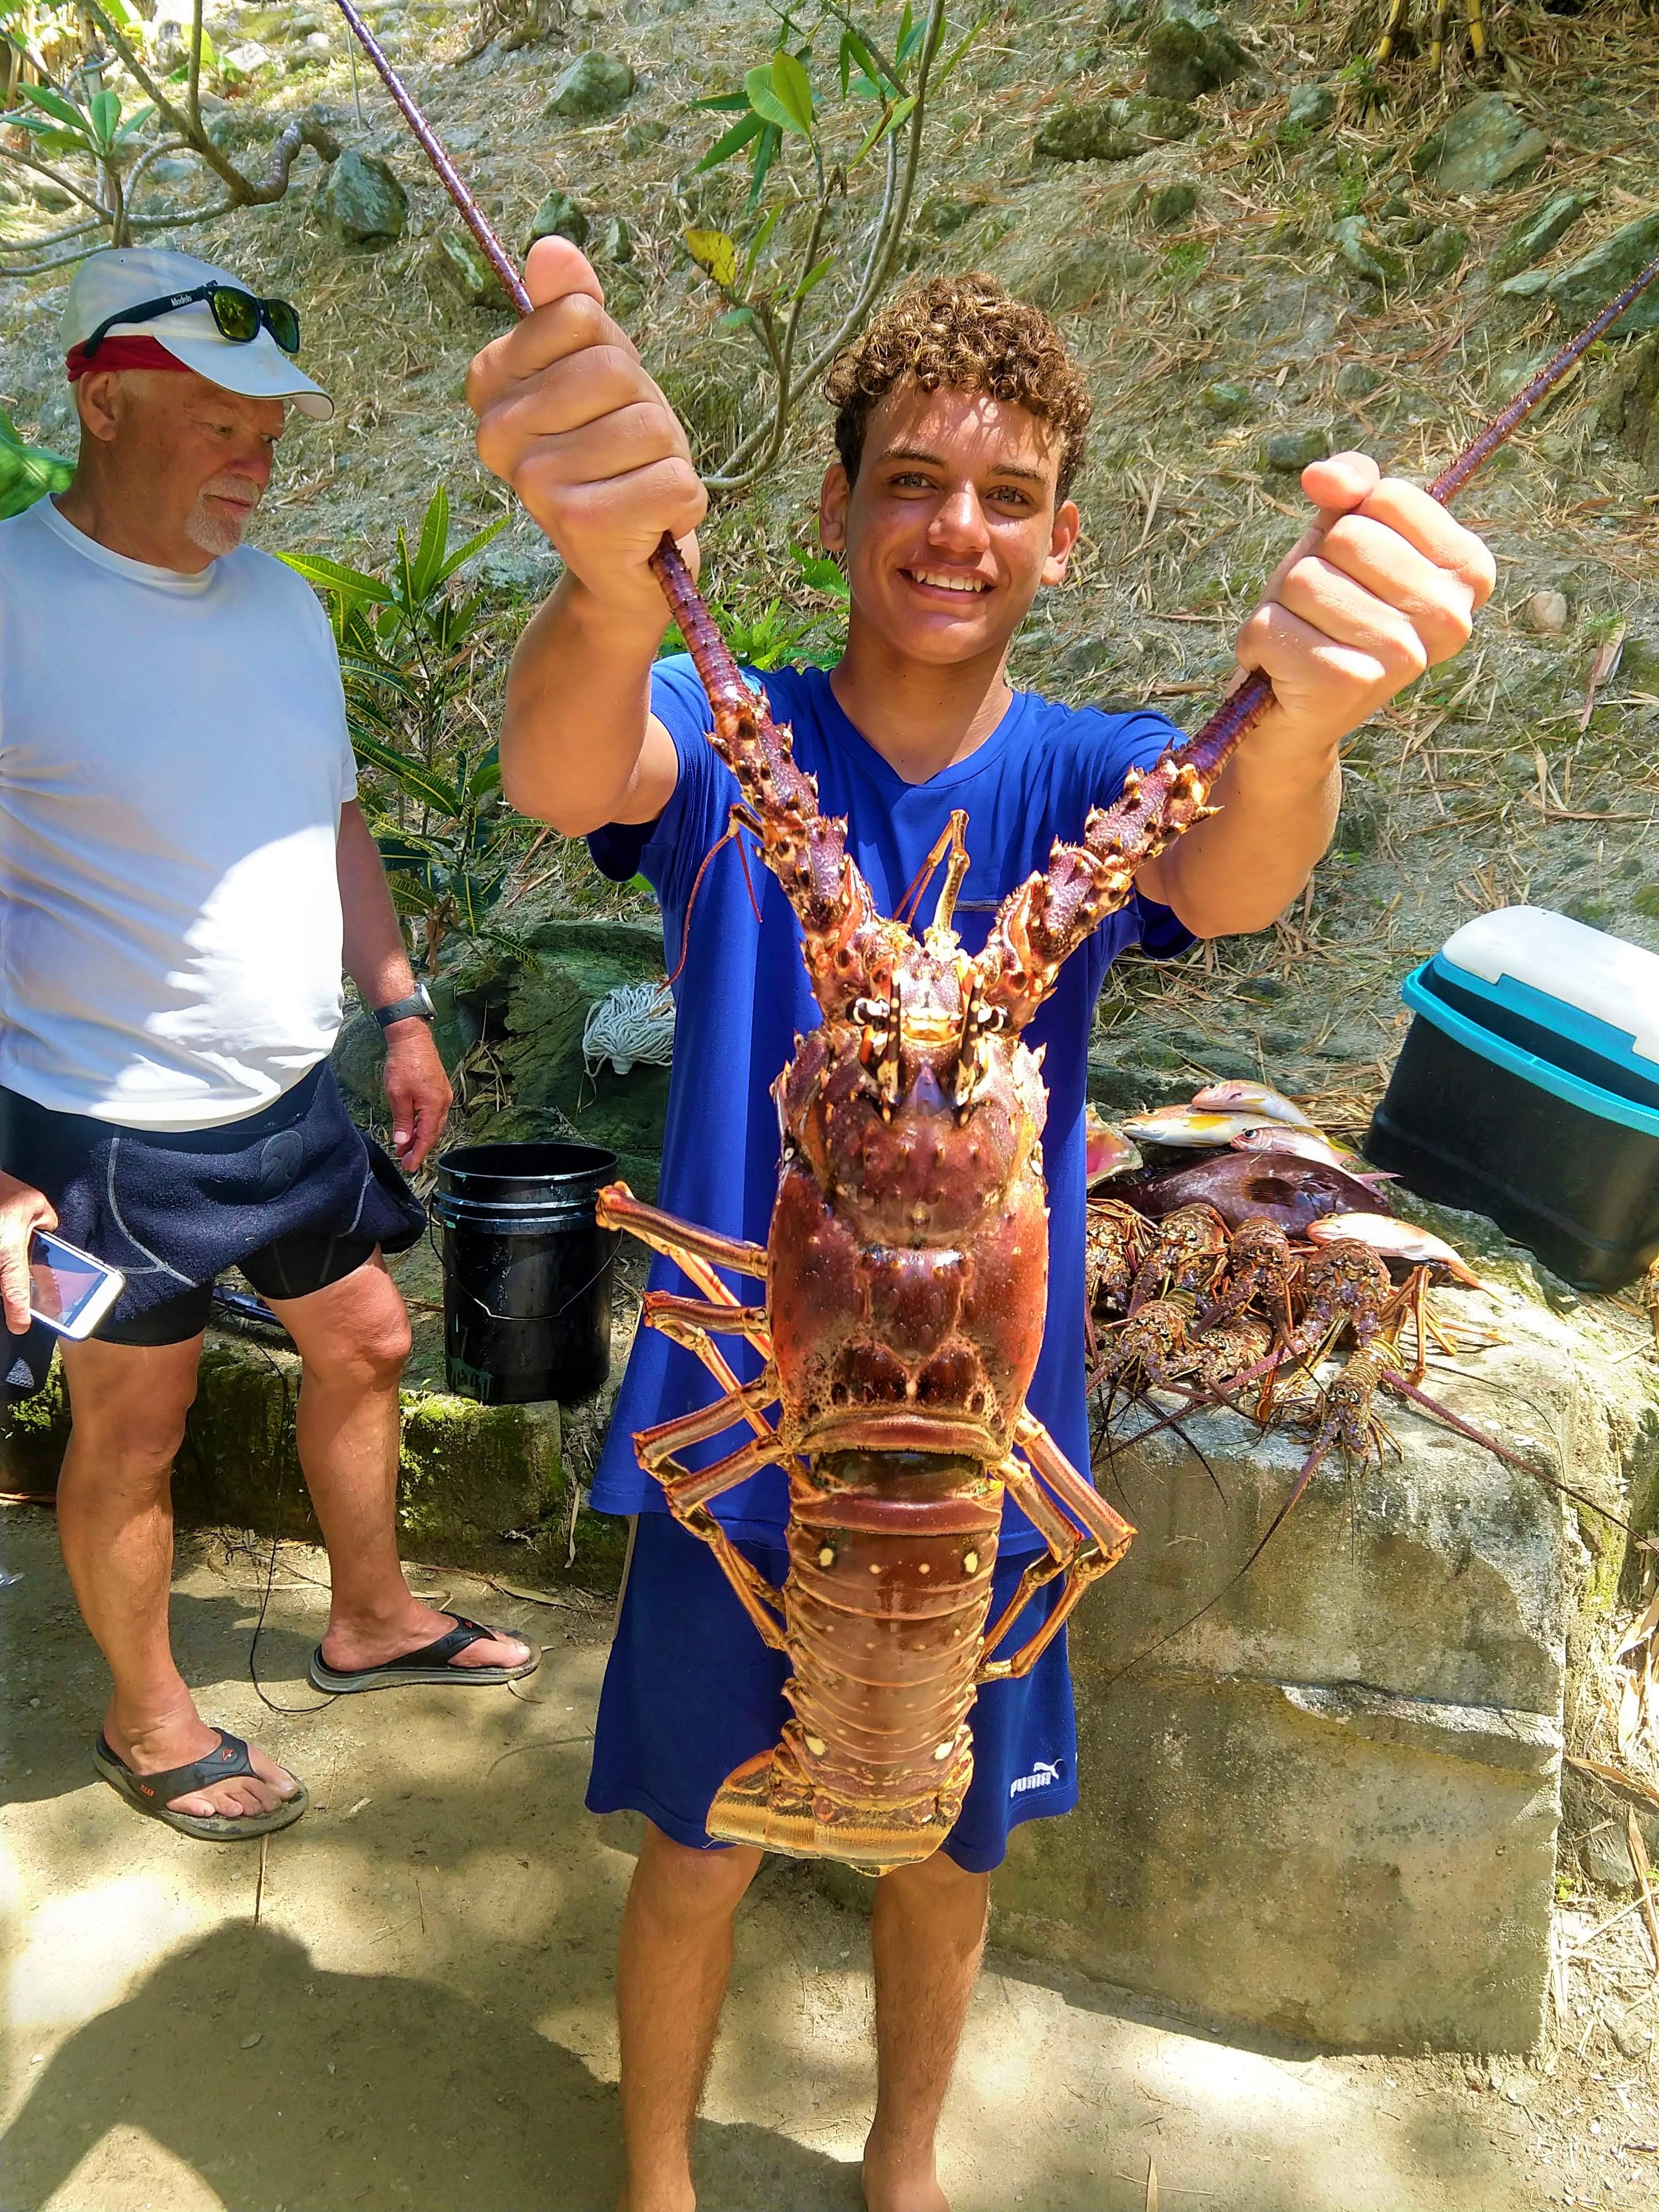 Jordan-with-Big-Lobster